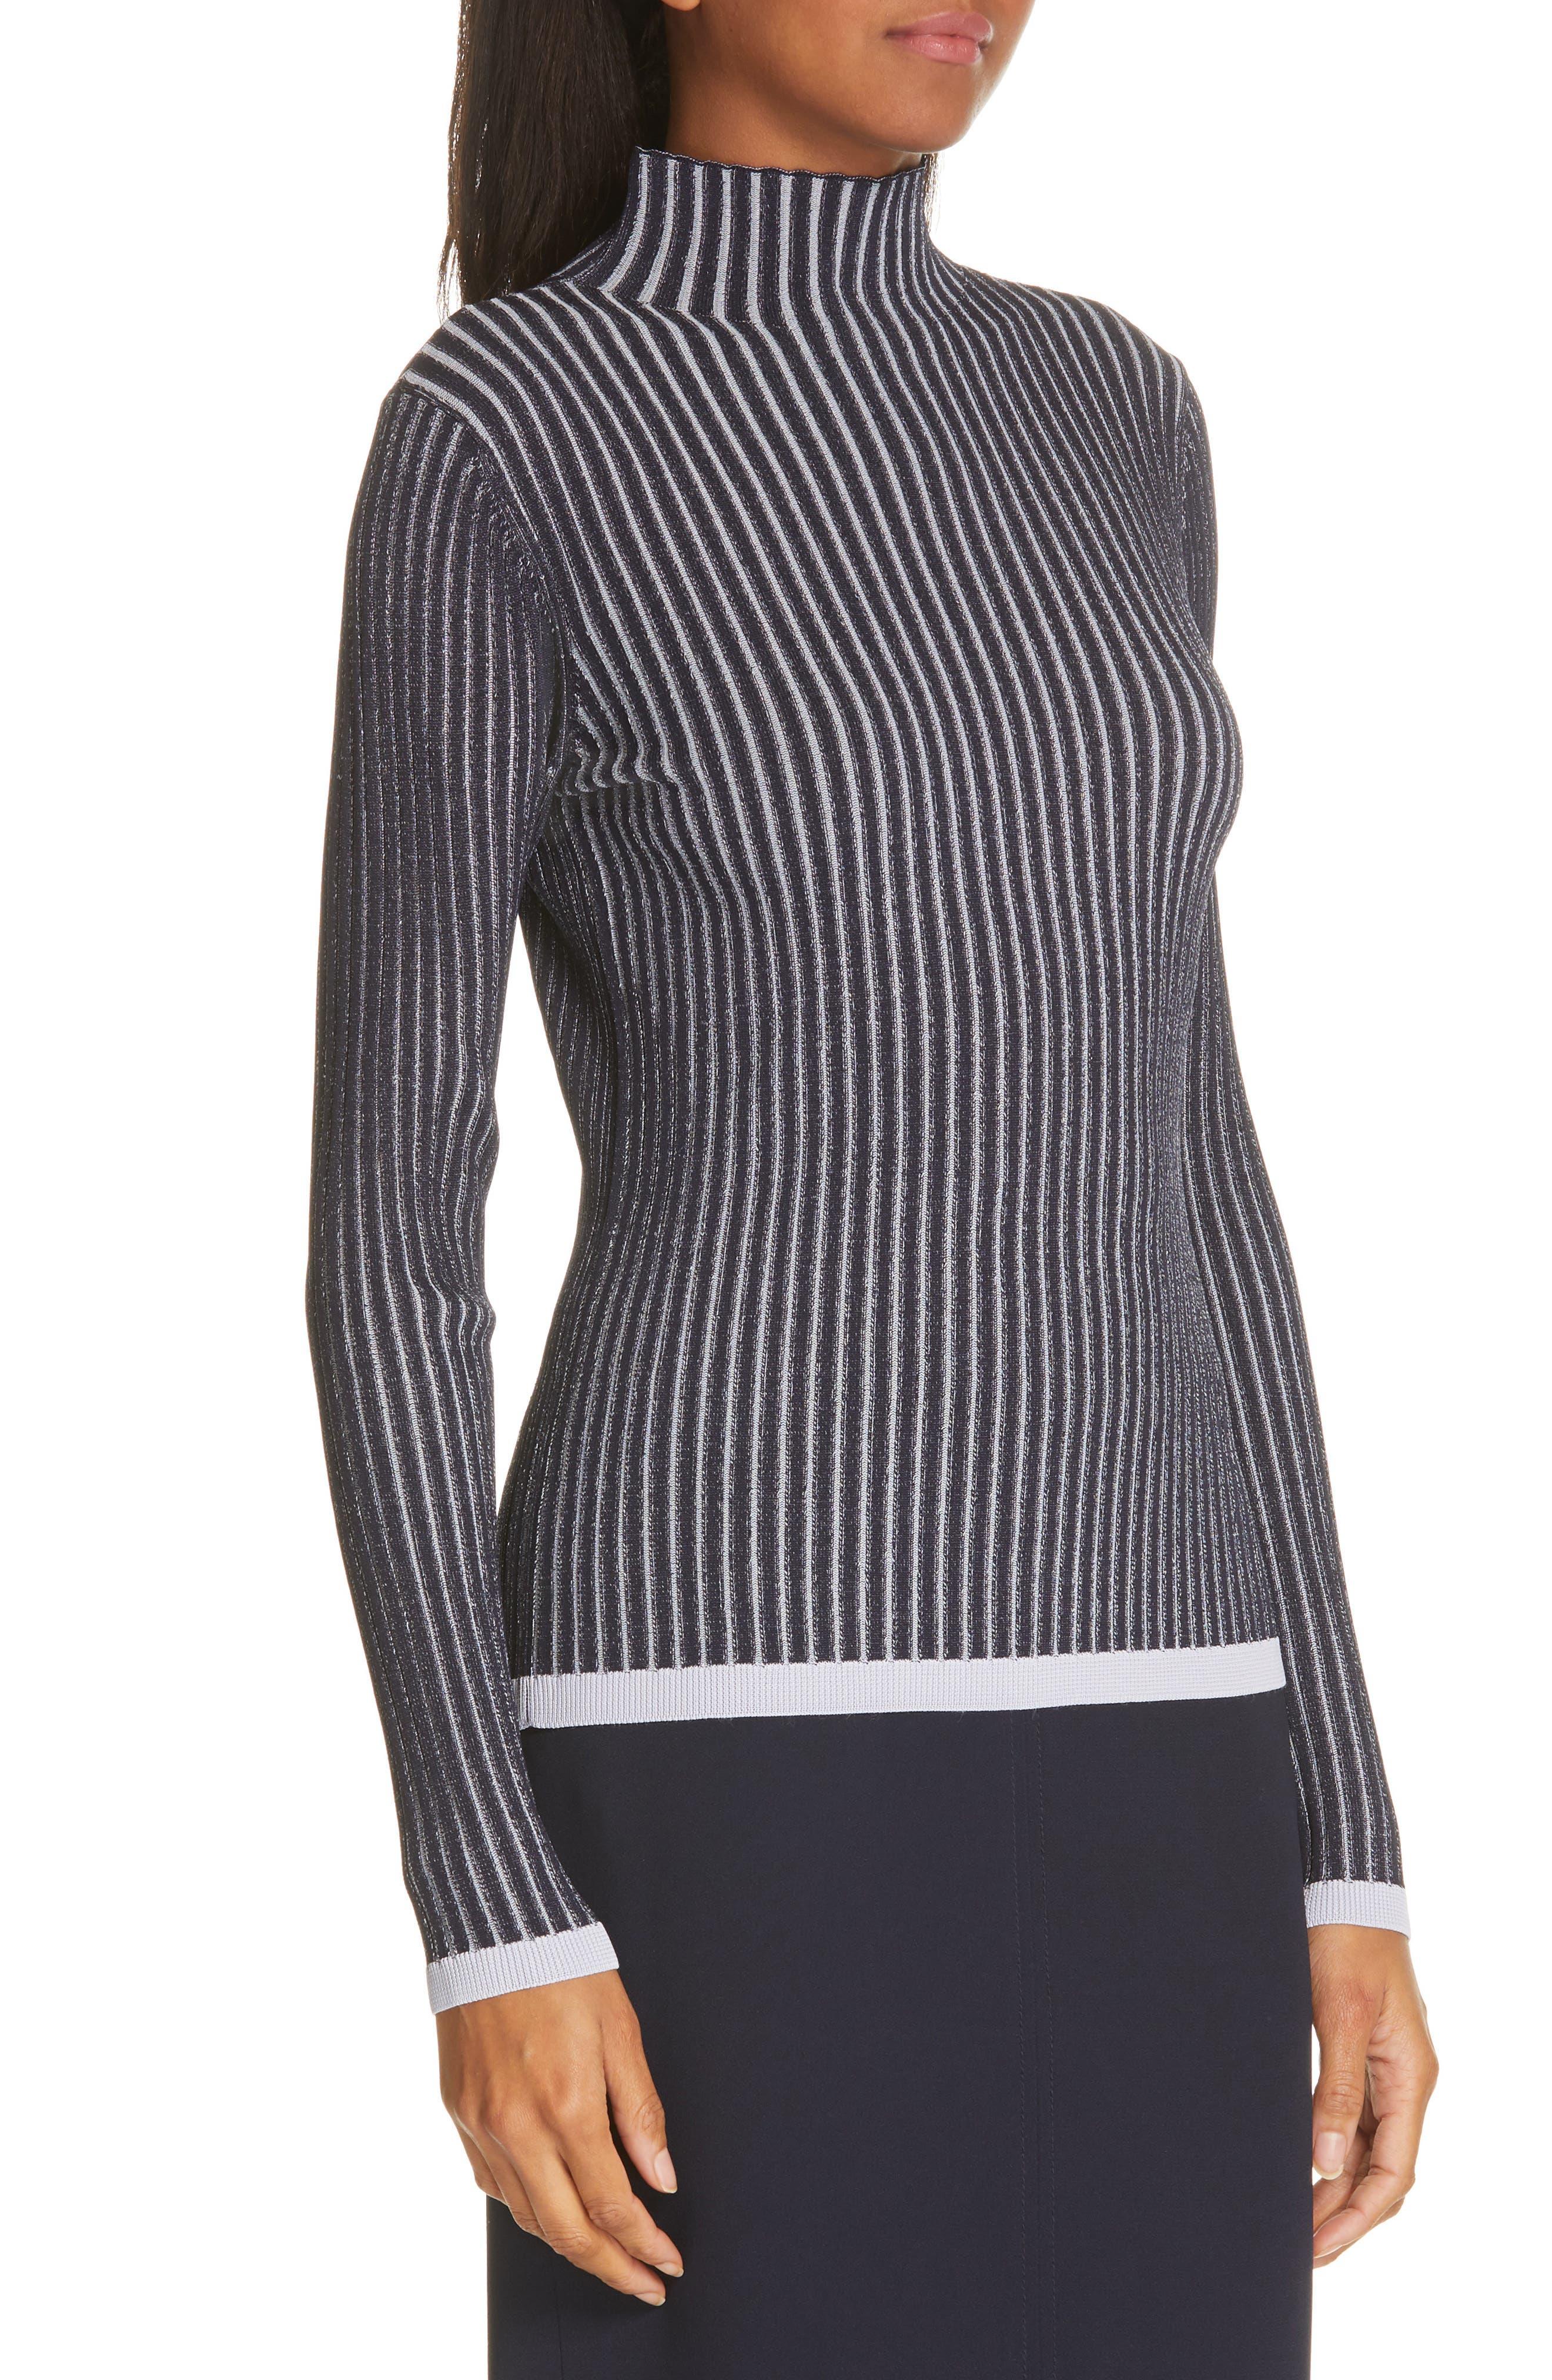 LEWIT, Stripe Ribbed Mock Neck Sweater, Alternate thumbnail 4, color, NAVY ICELANDIC STRIPE